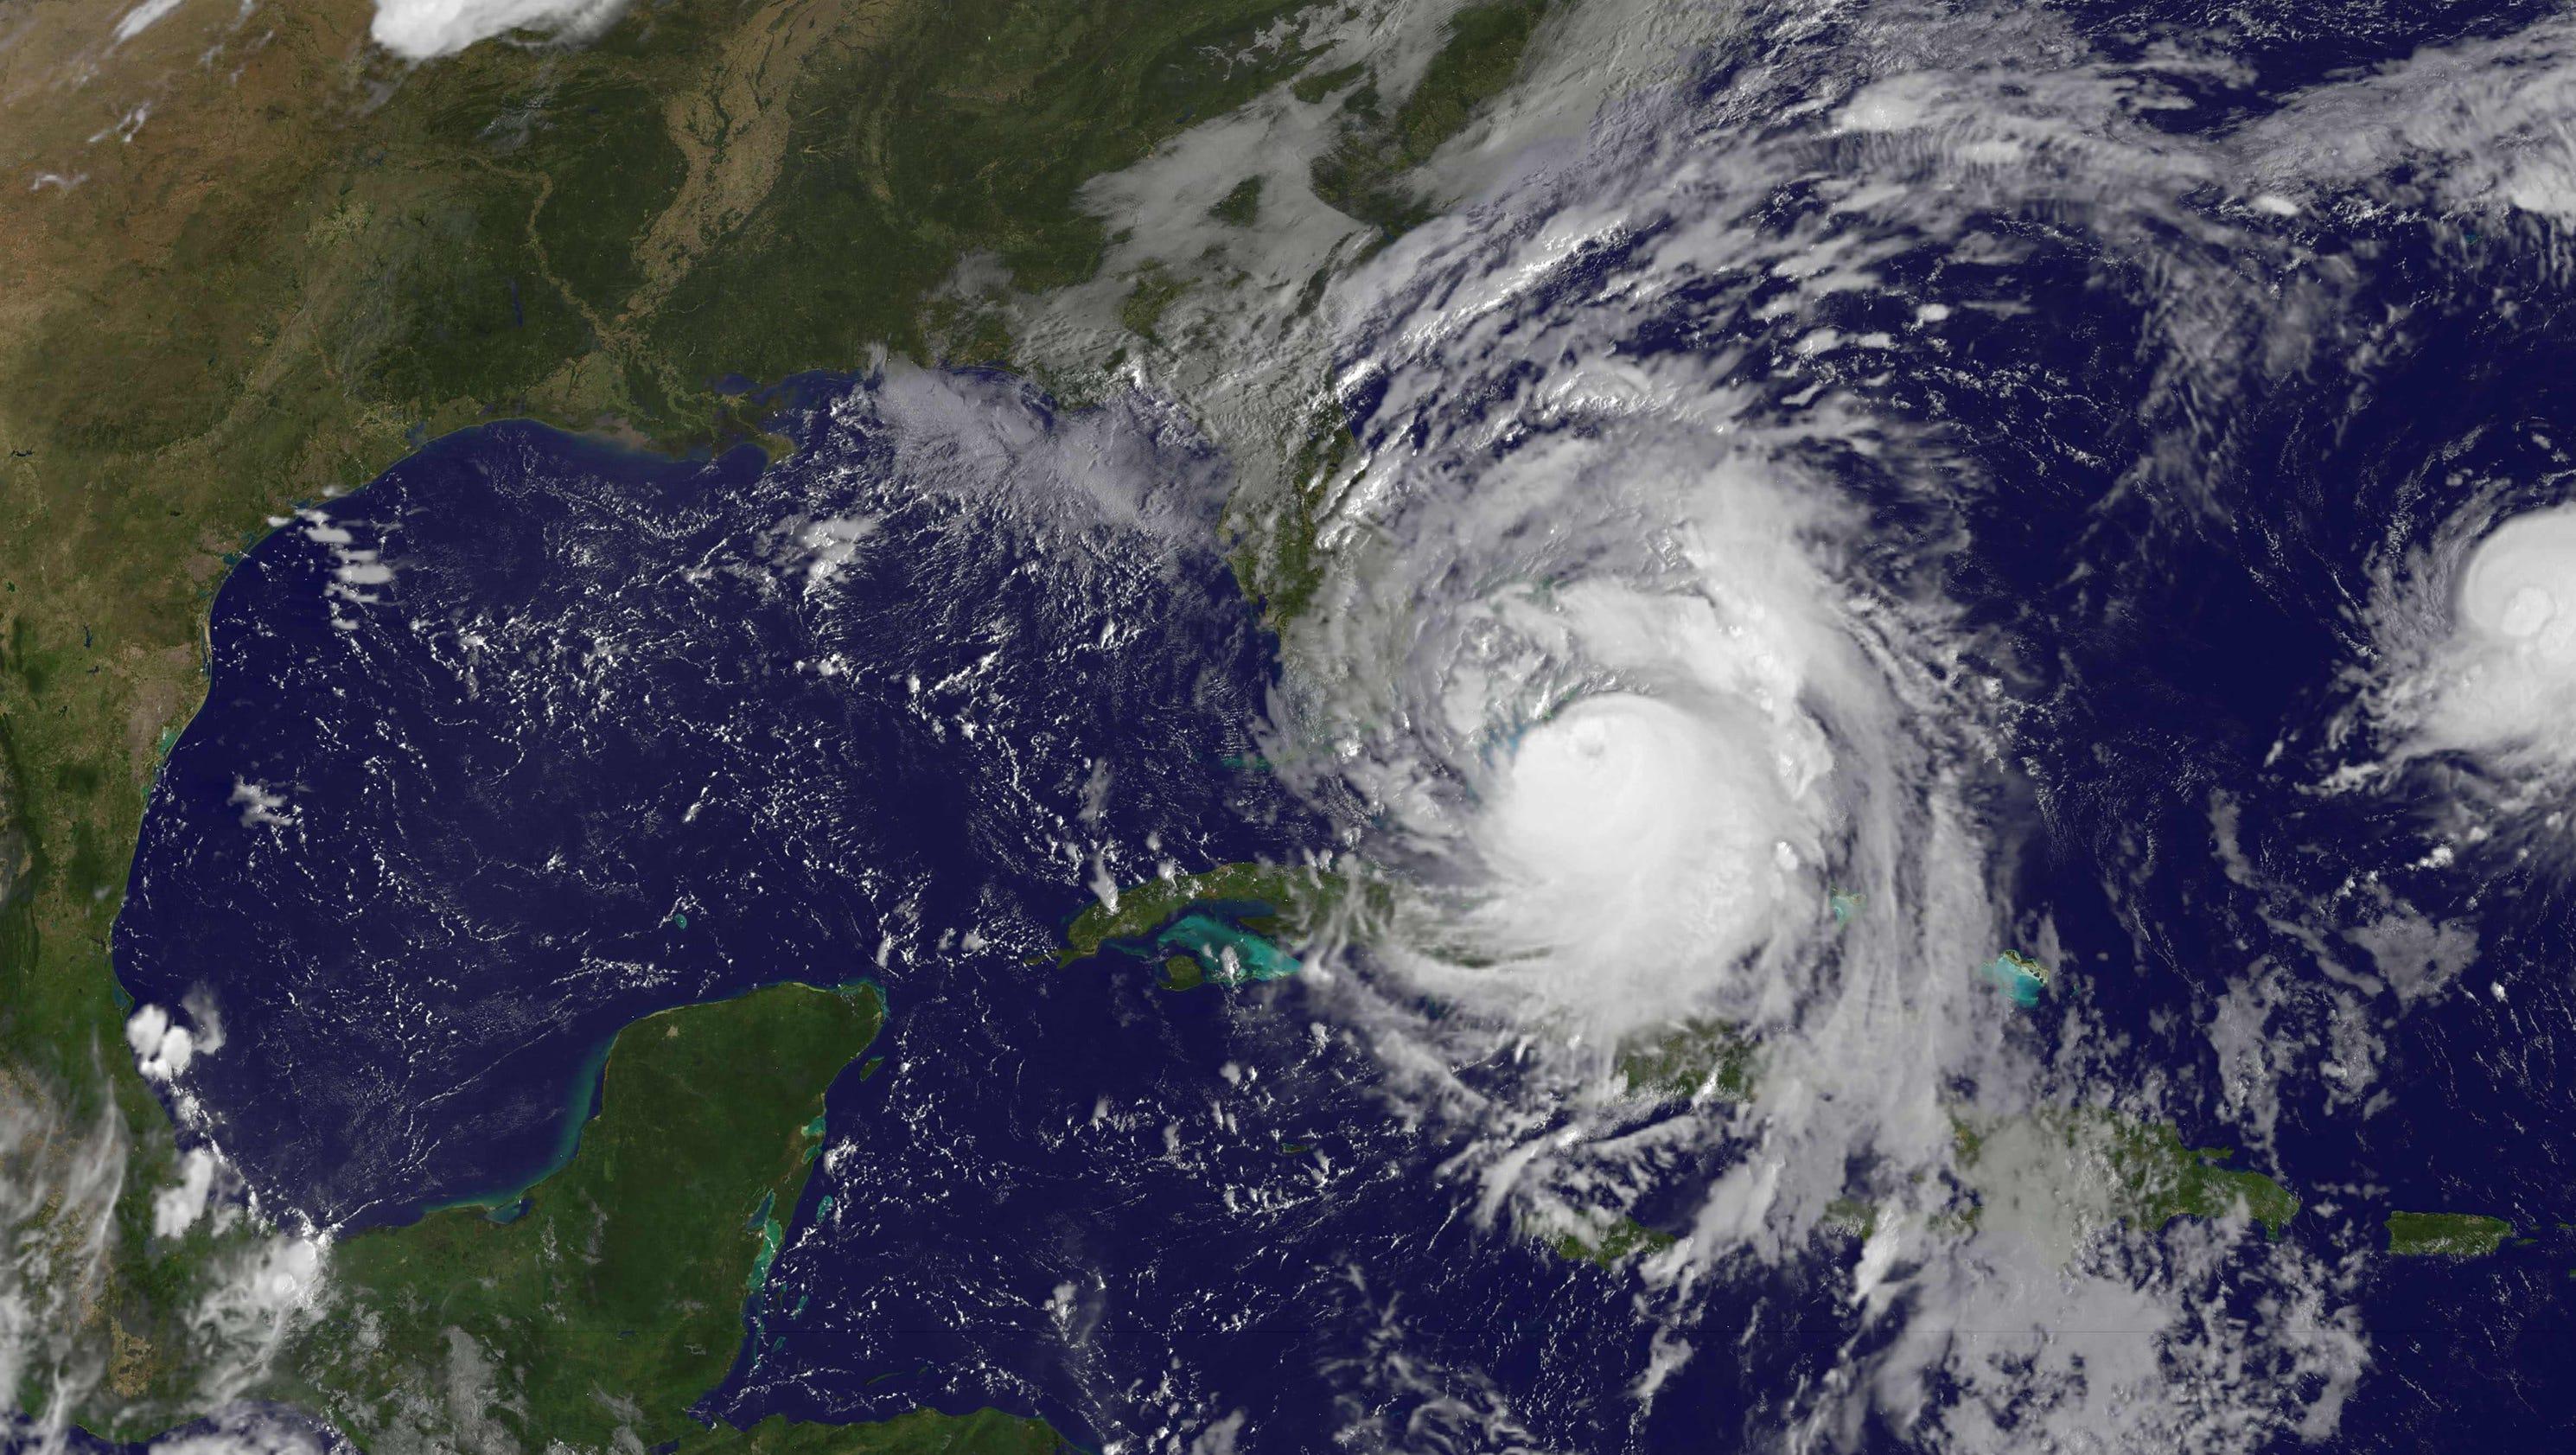 Hurricane season ends, busiest since 2010